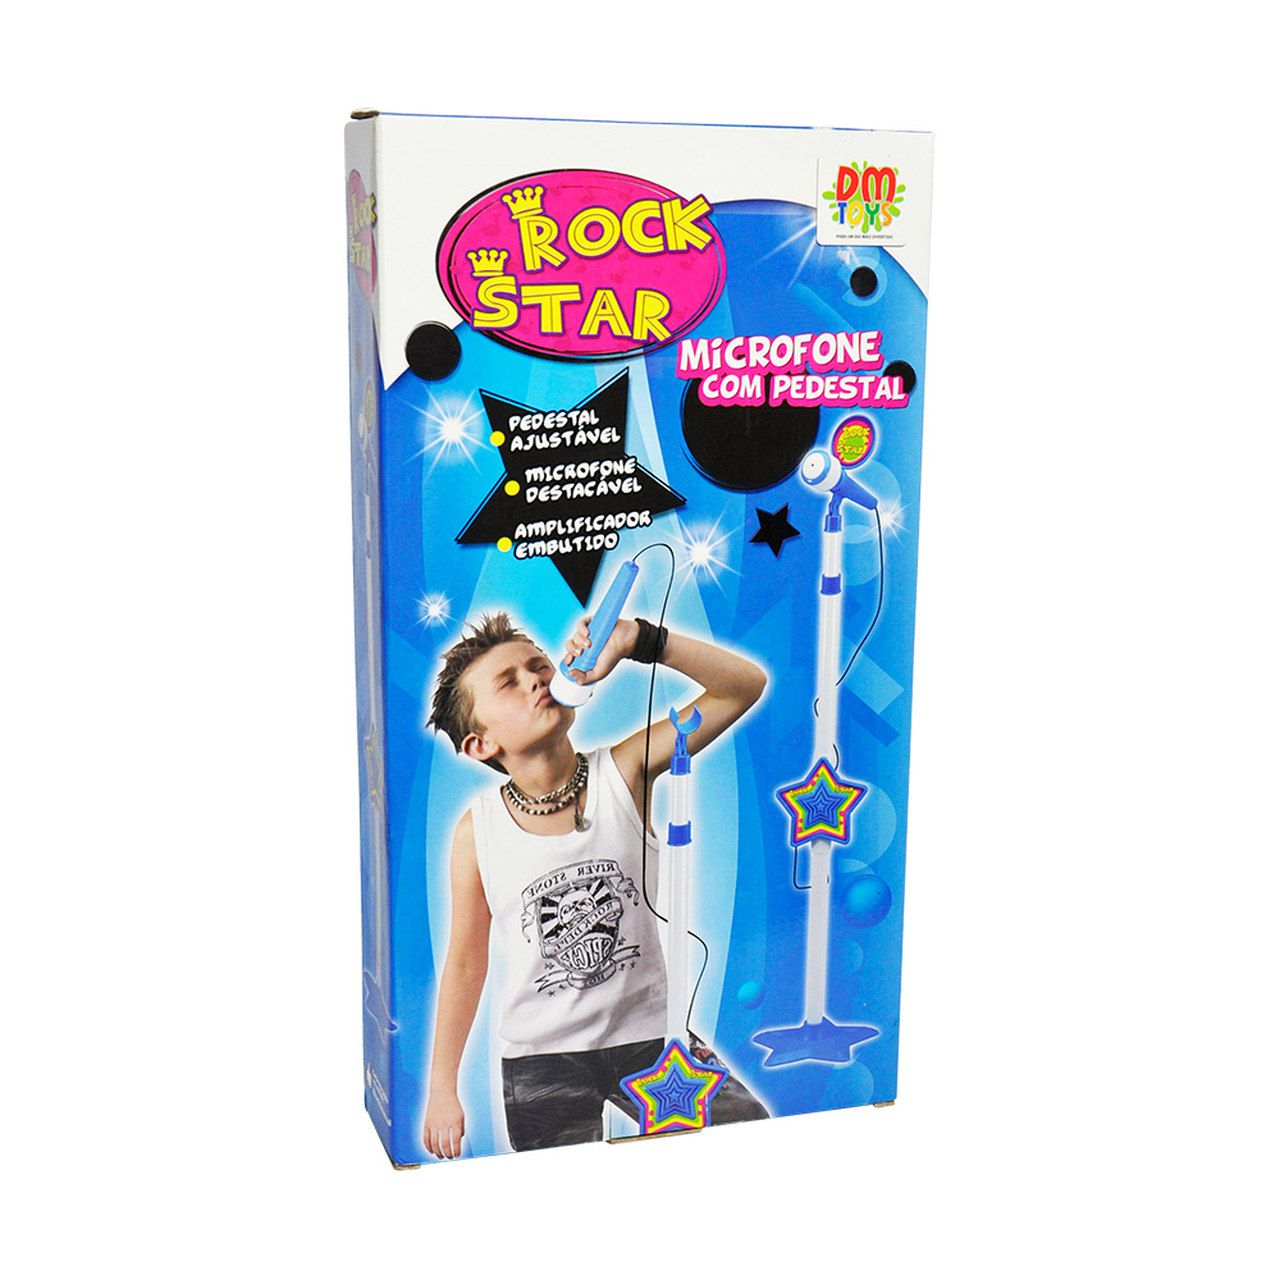 Microfone Infantil Com Pedestal Rock Star - DMToys 3837